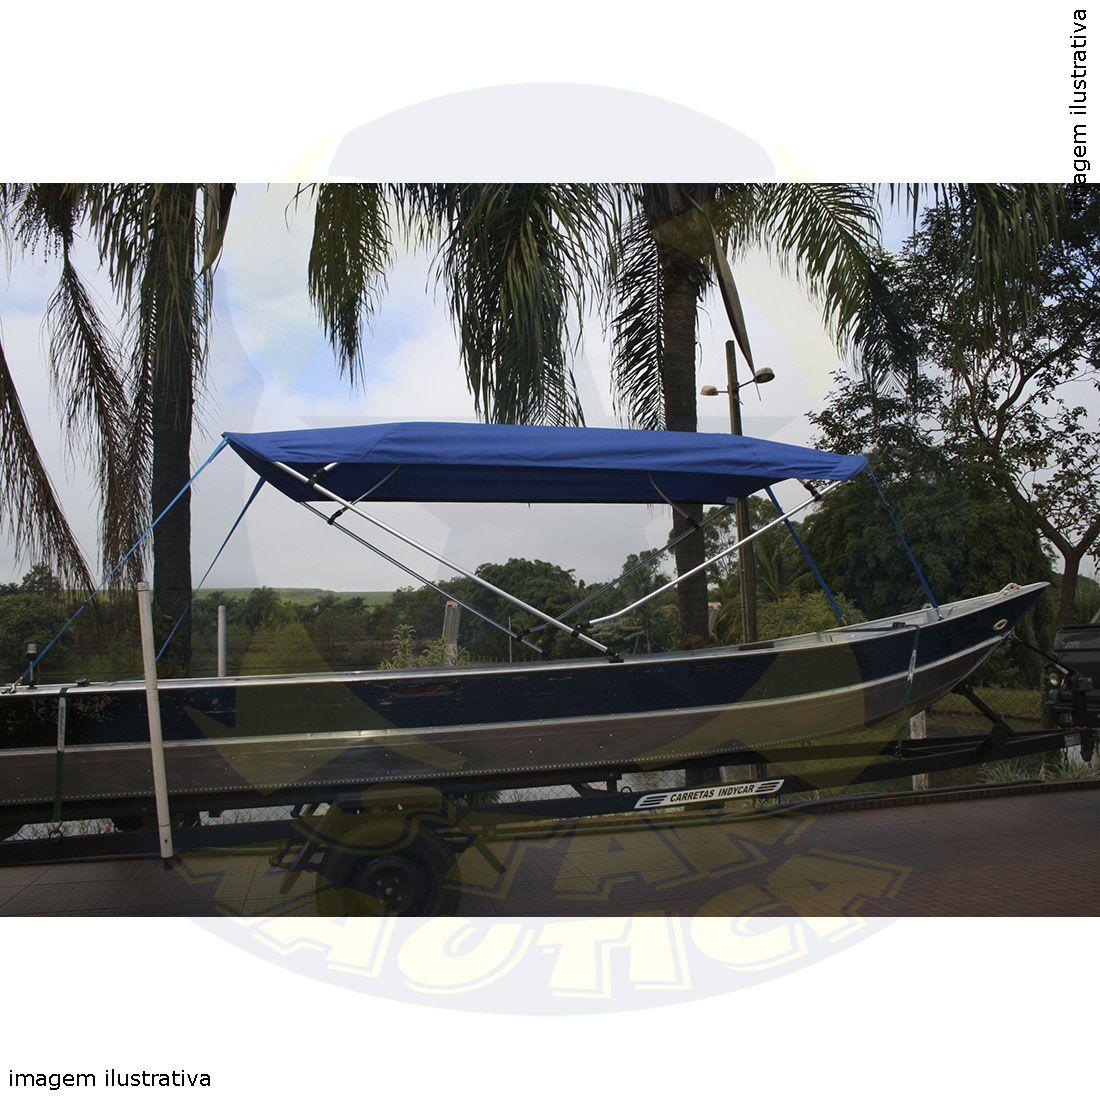 Capota Toldo Barco Karib 500 Vinílica 4 Arcos Tubo 1 1/4